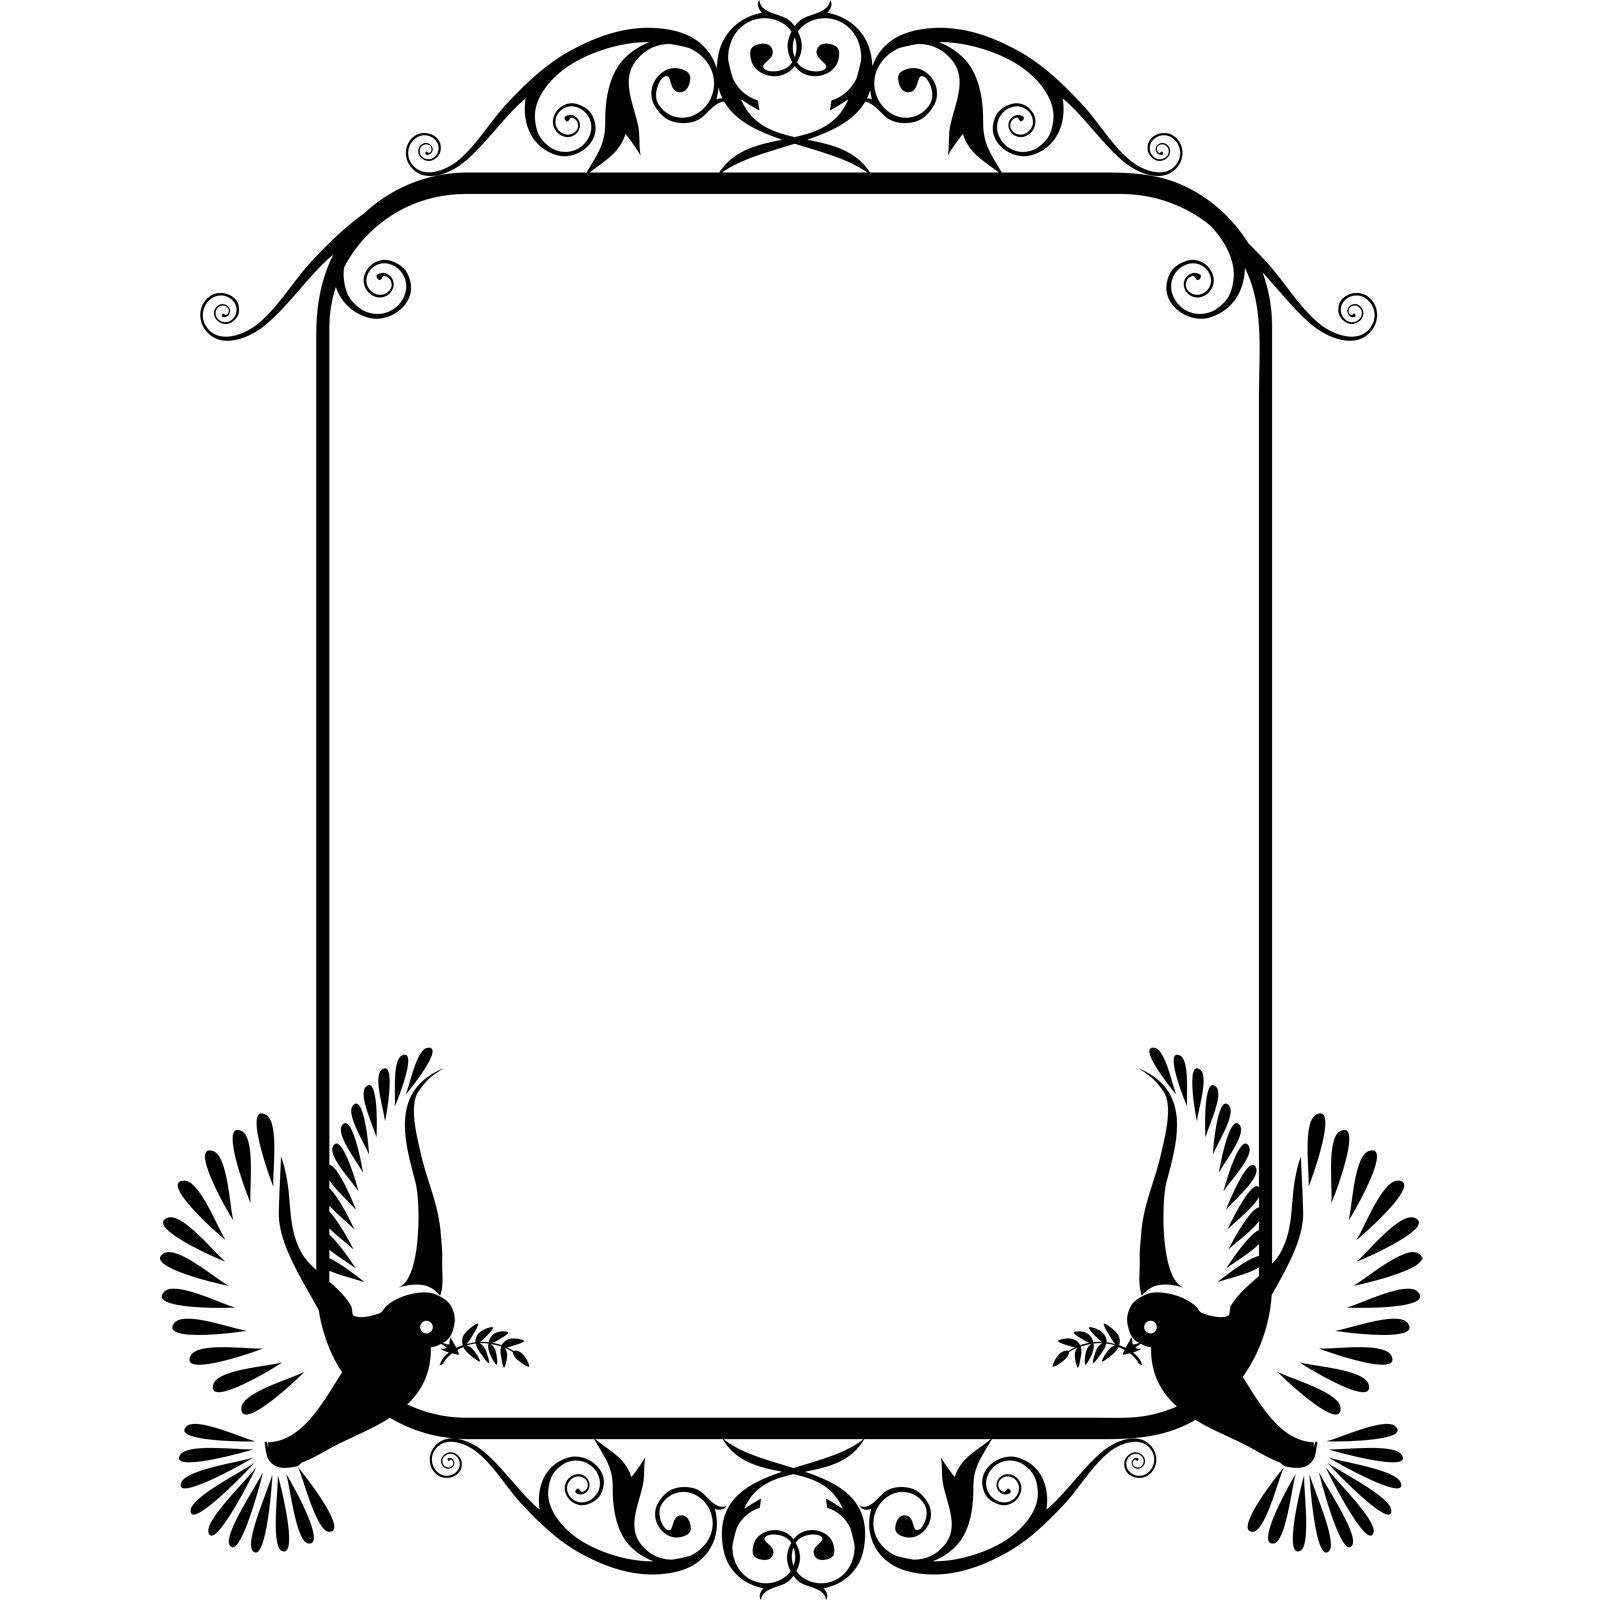 Bird Frame Frame Wall Sticker - World of Wall Stickers